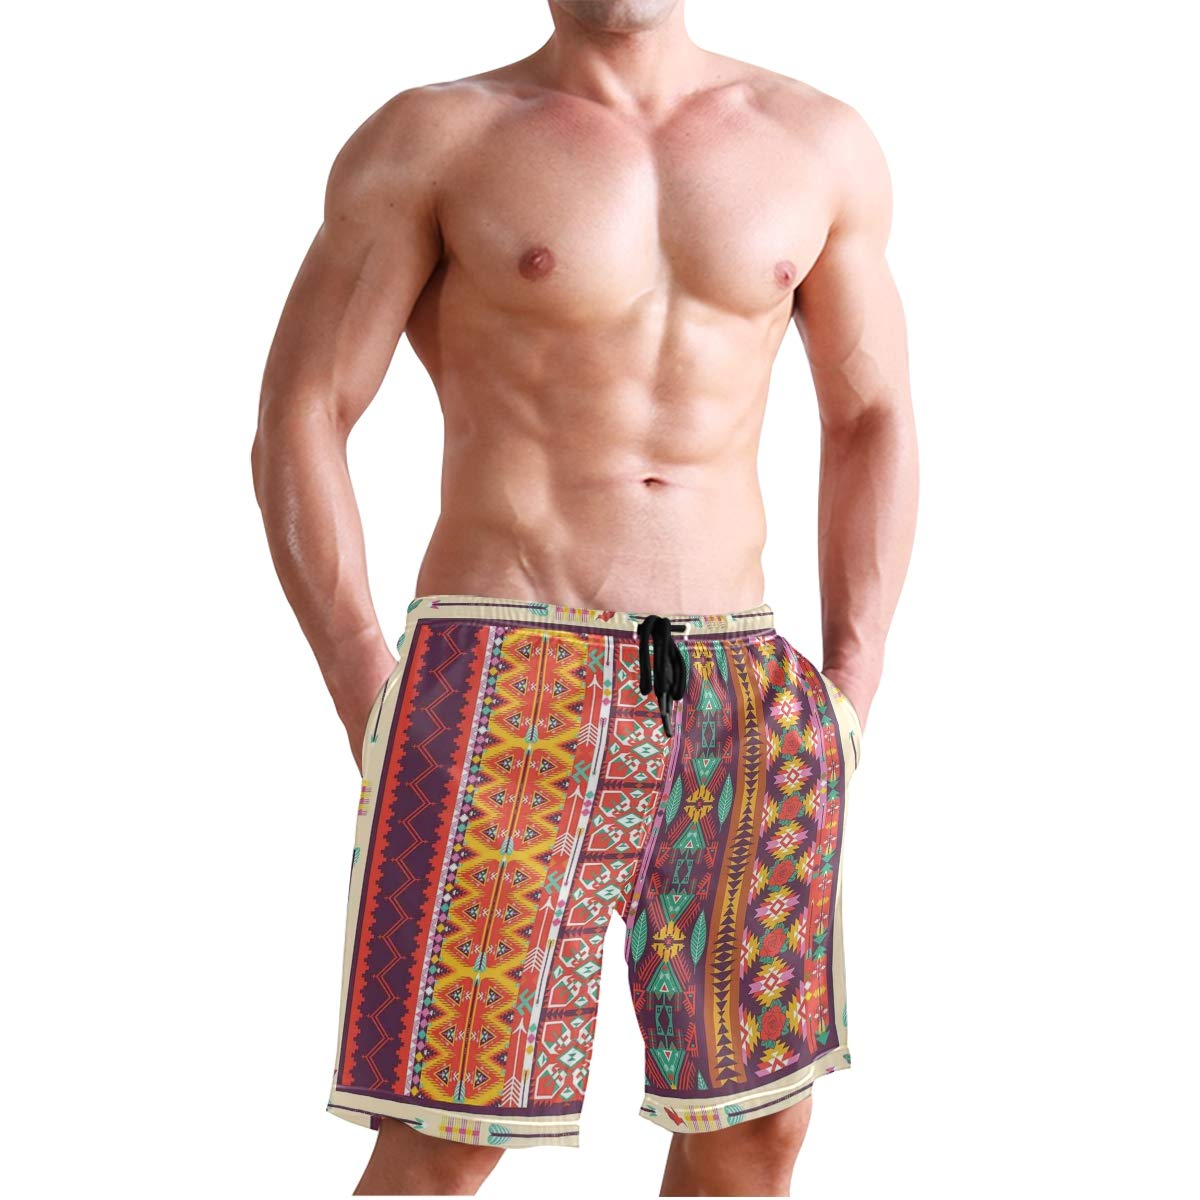 KVMV Colorful Patchwork Art Oriental Patterns Ornaments Cult Quick Dry Beach Shorts